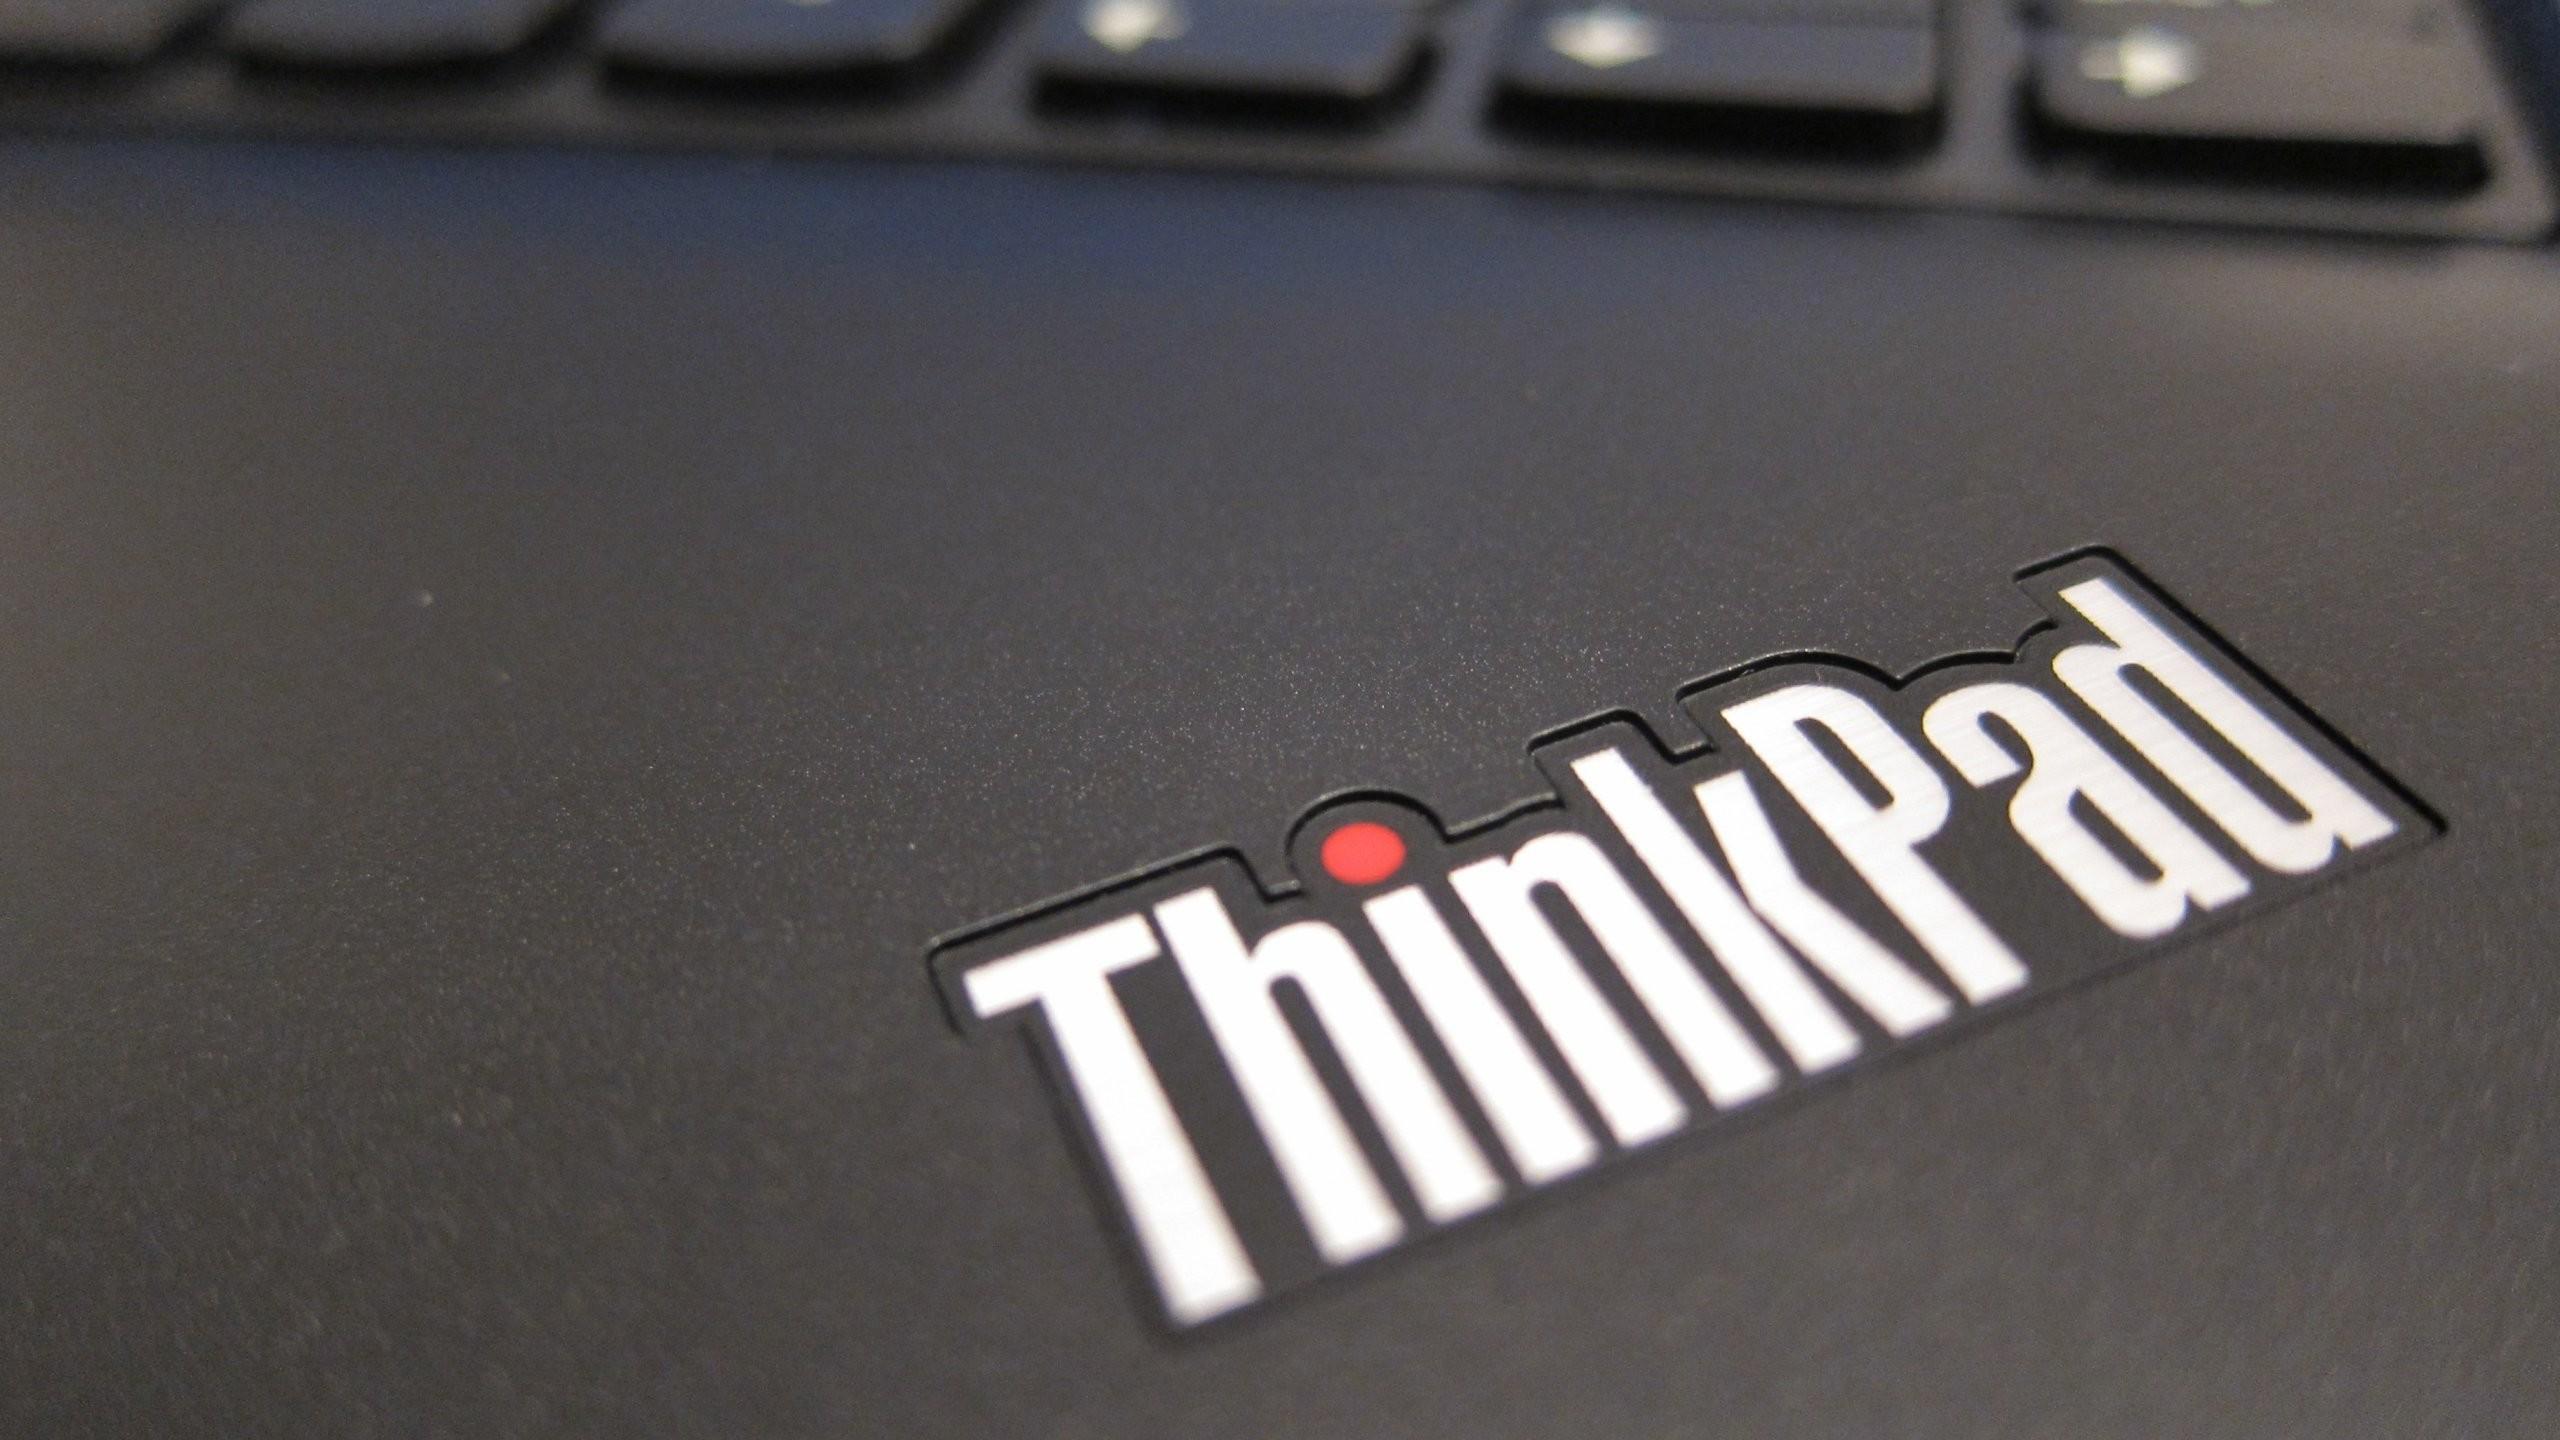 Lenovo Thinkpad Desktop Wallpaper.